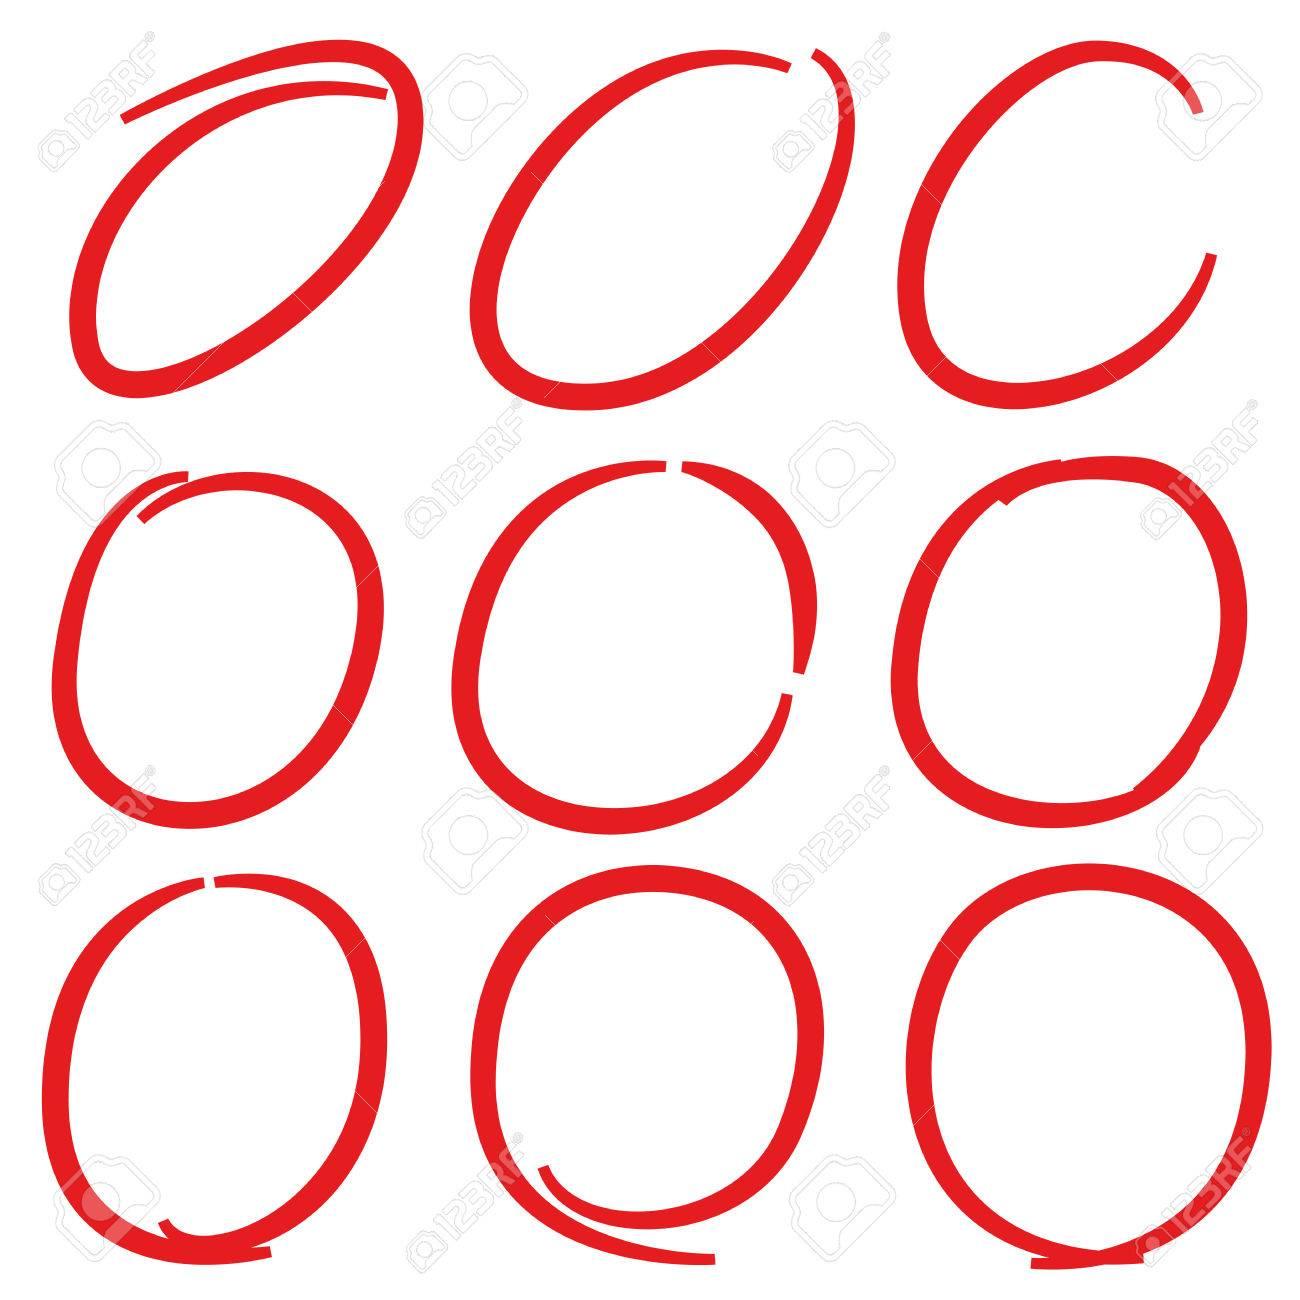 red hand drawn circle